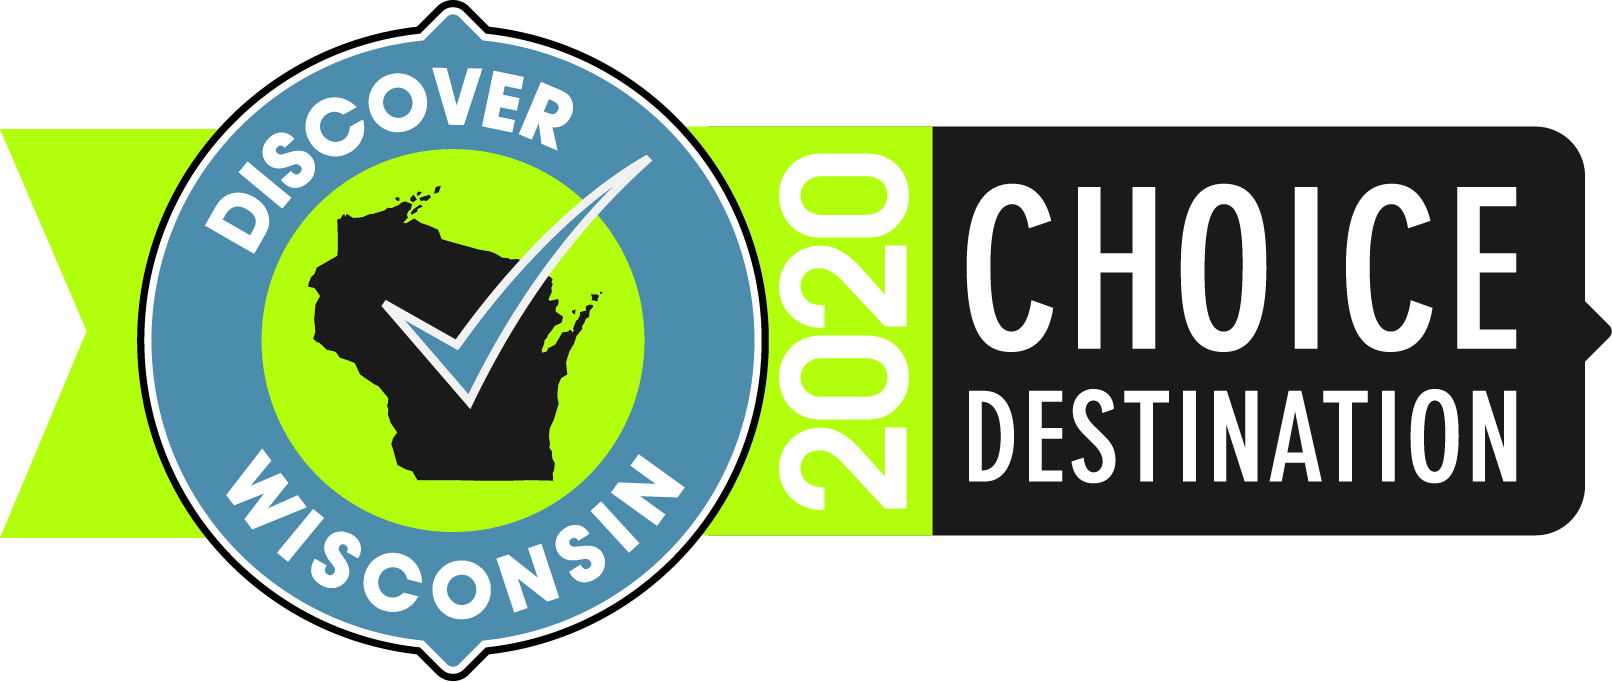 Discover Wisconsin - 2020 Choice Destination